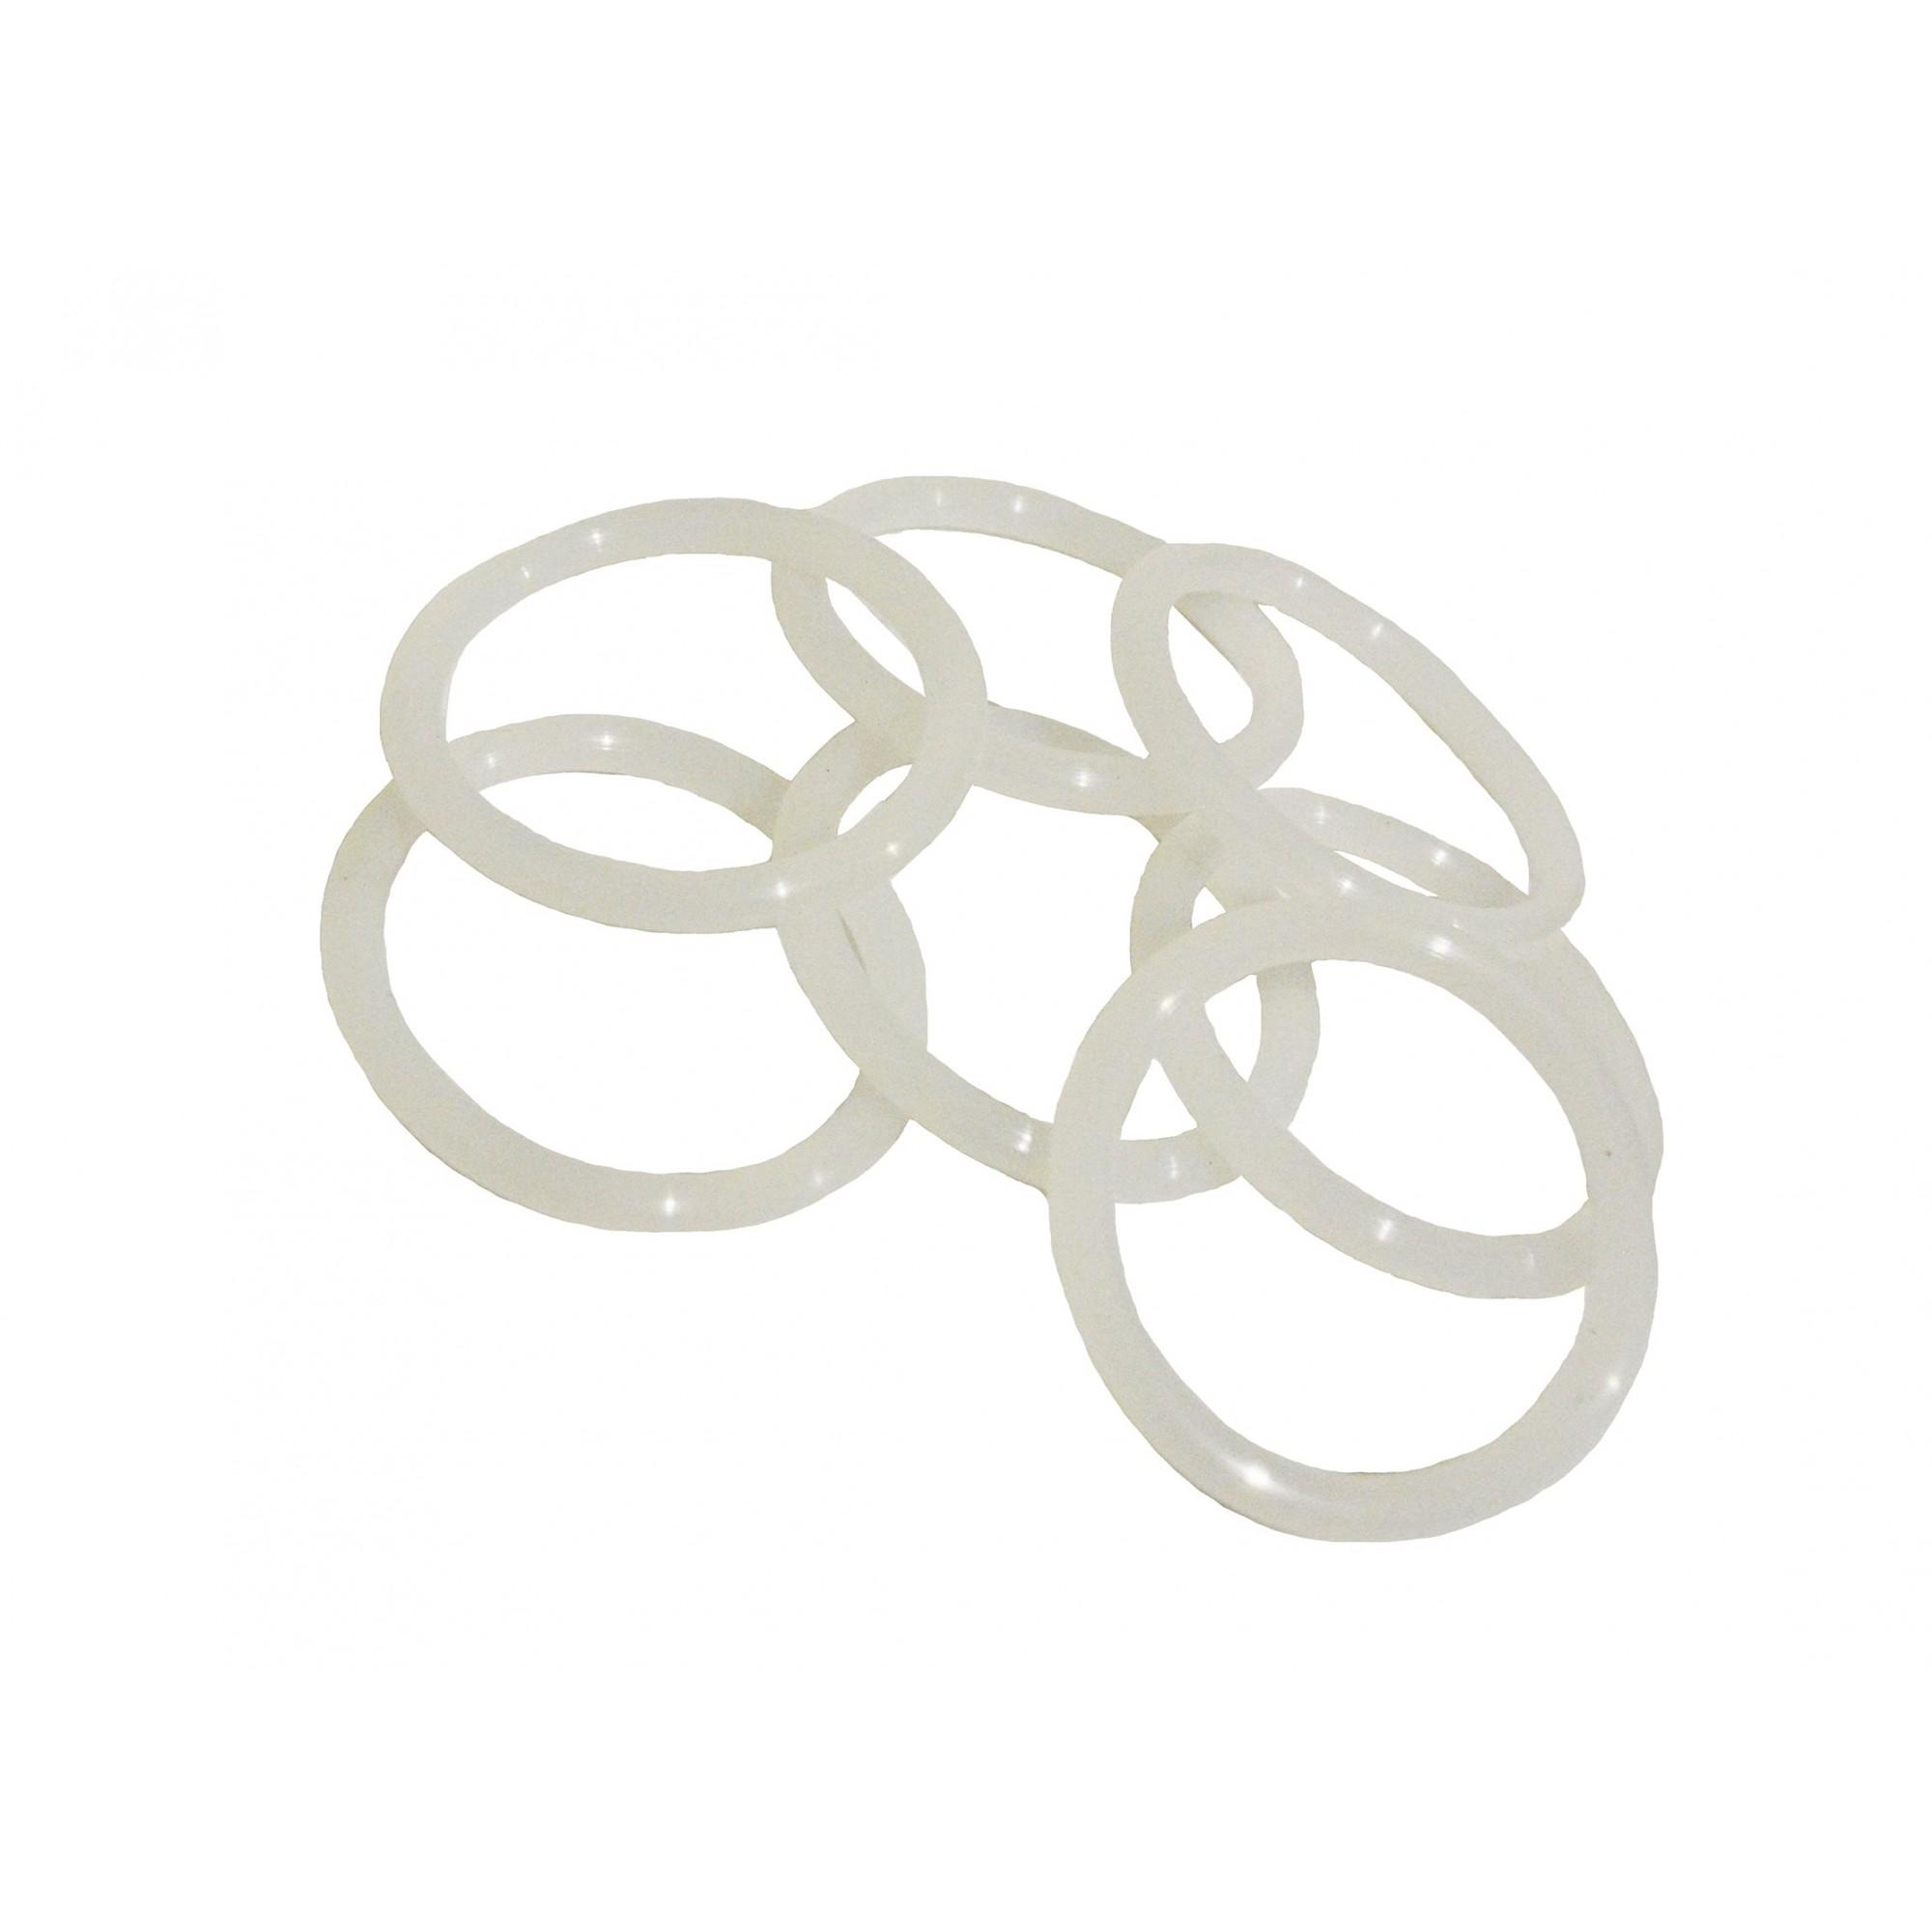 Упаковка силиконовых прокладок 100 шт кольцо на американку под пайку 25 34мм*3.5мм J.G. - 1